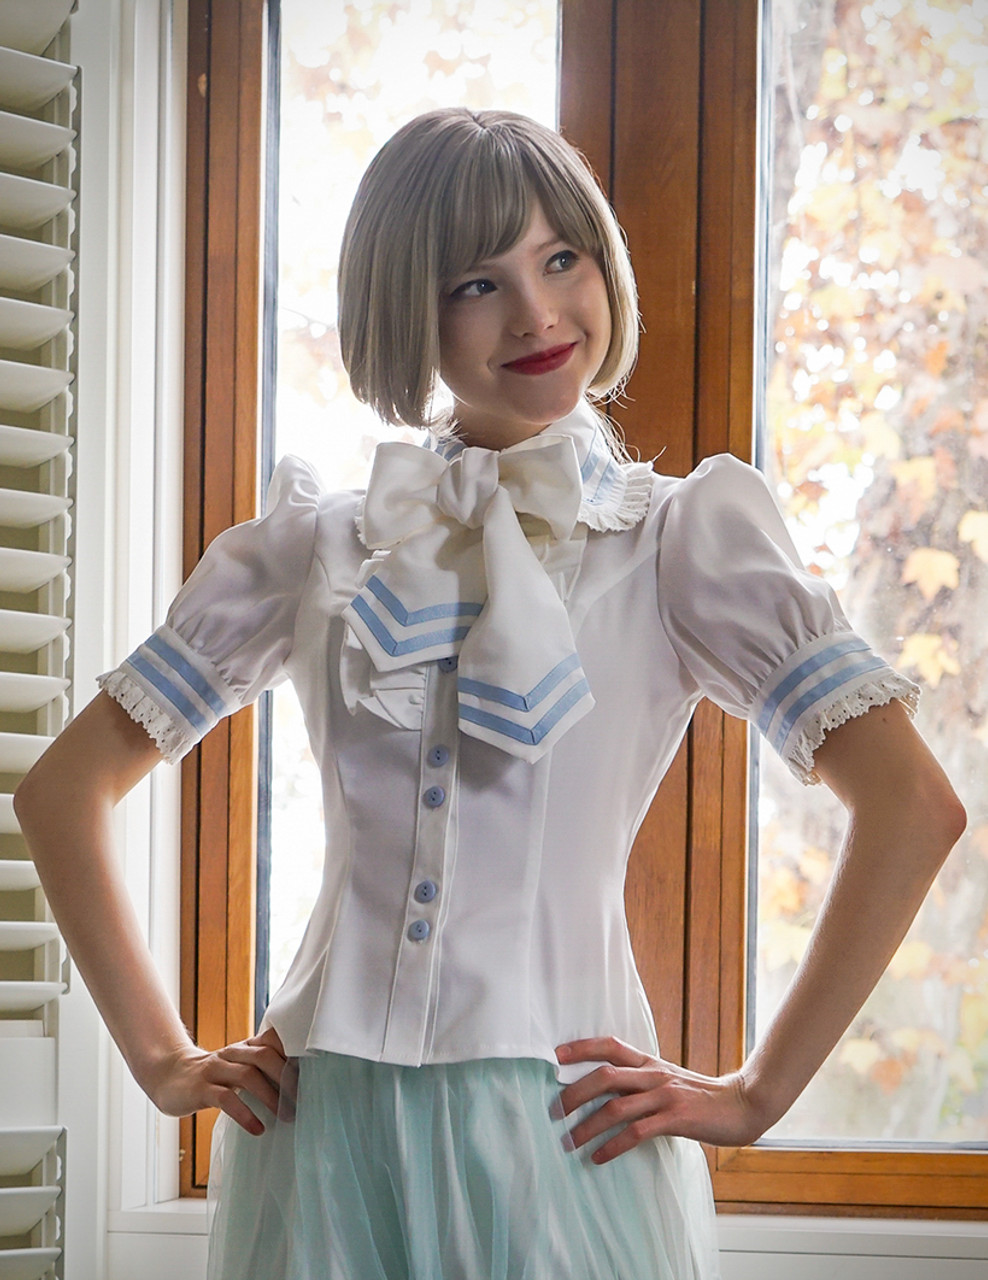 4fbff0e1ec9d Lolita Short Sleeves Shirt Summer Blouse Neck Tie Set White Black